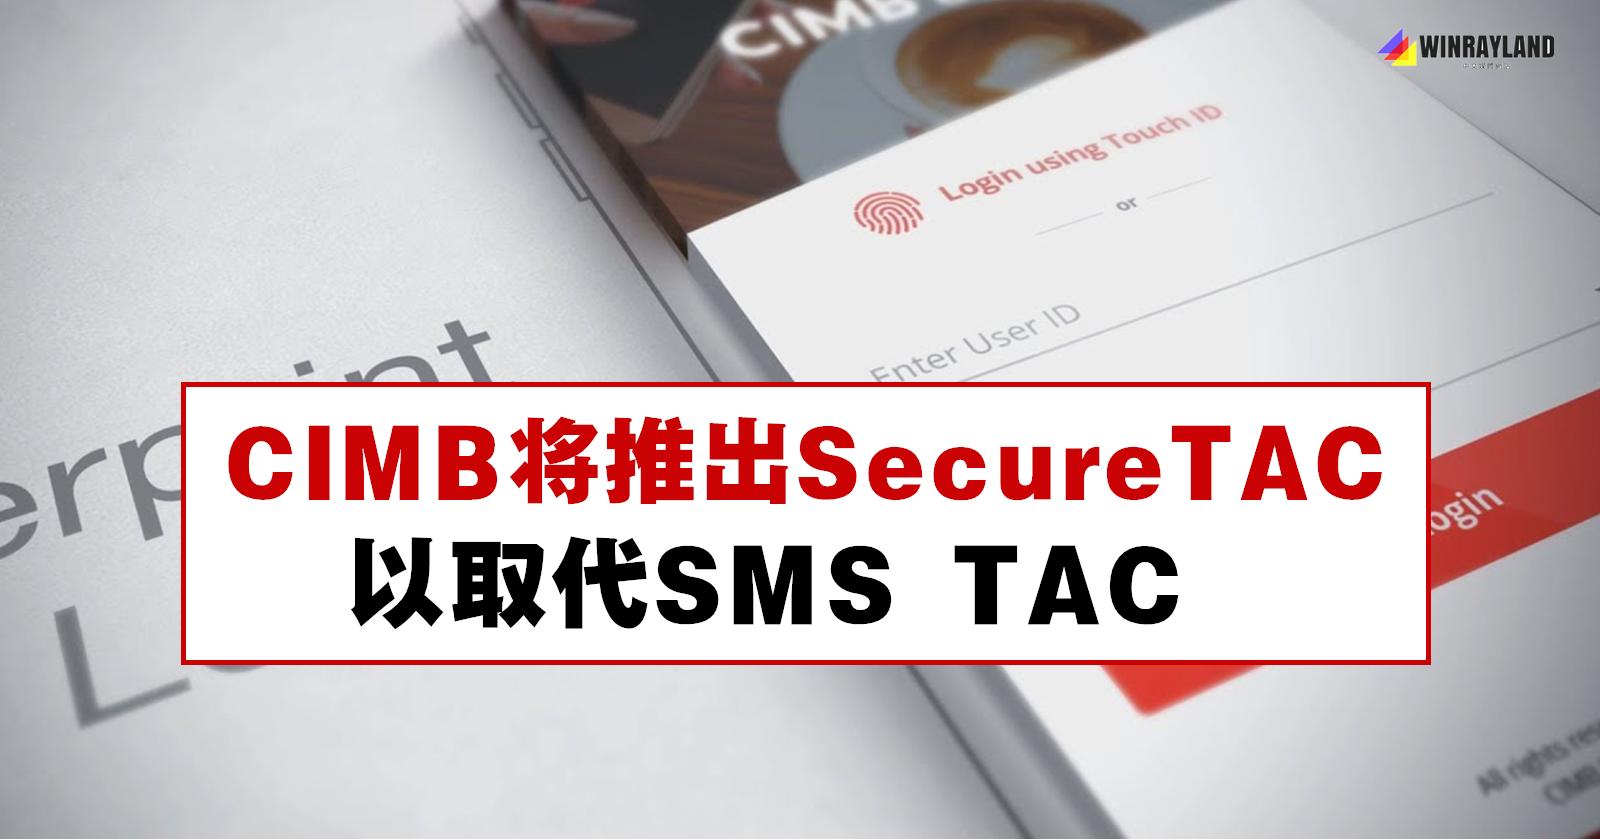 CIMB将推出SecureTAC以取代SMS TAC